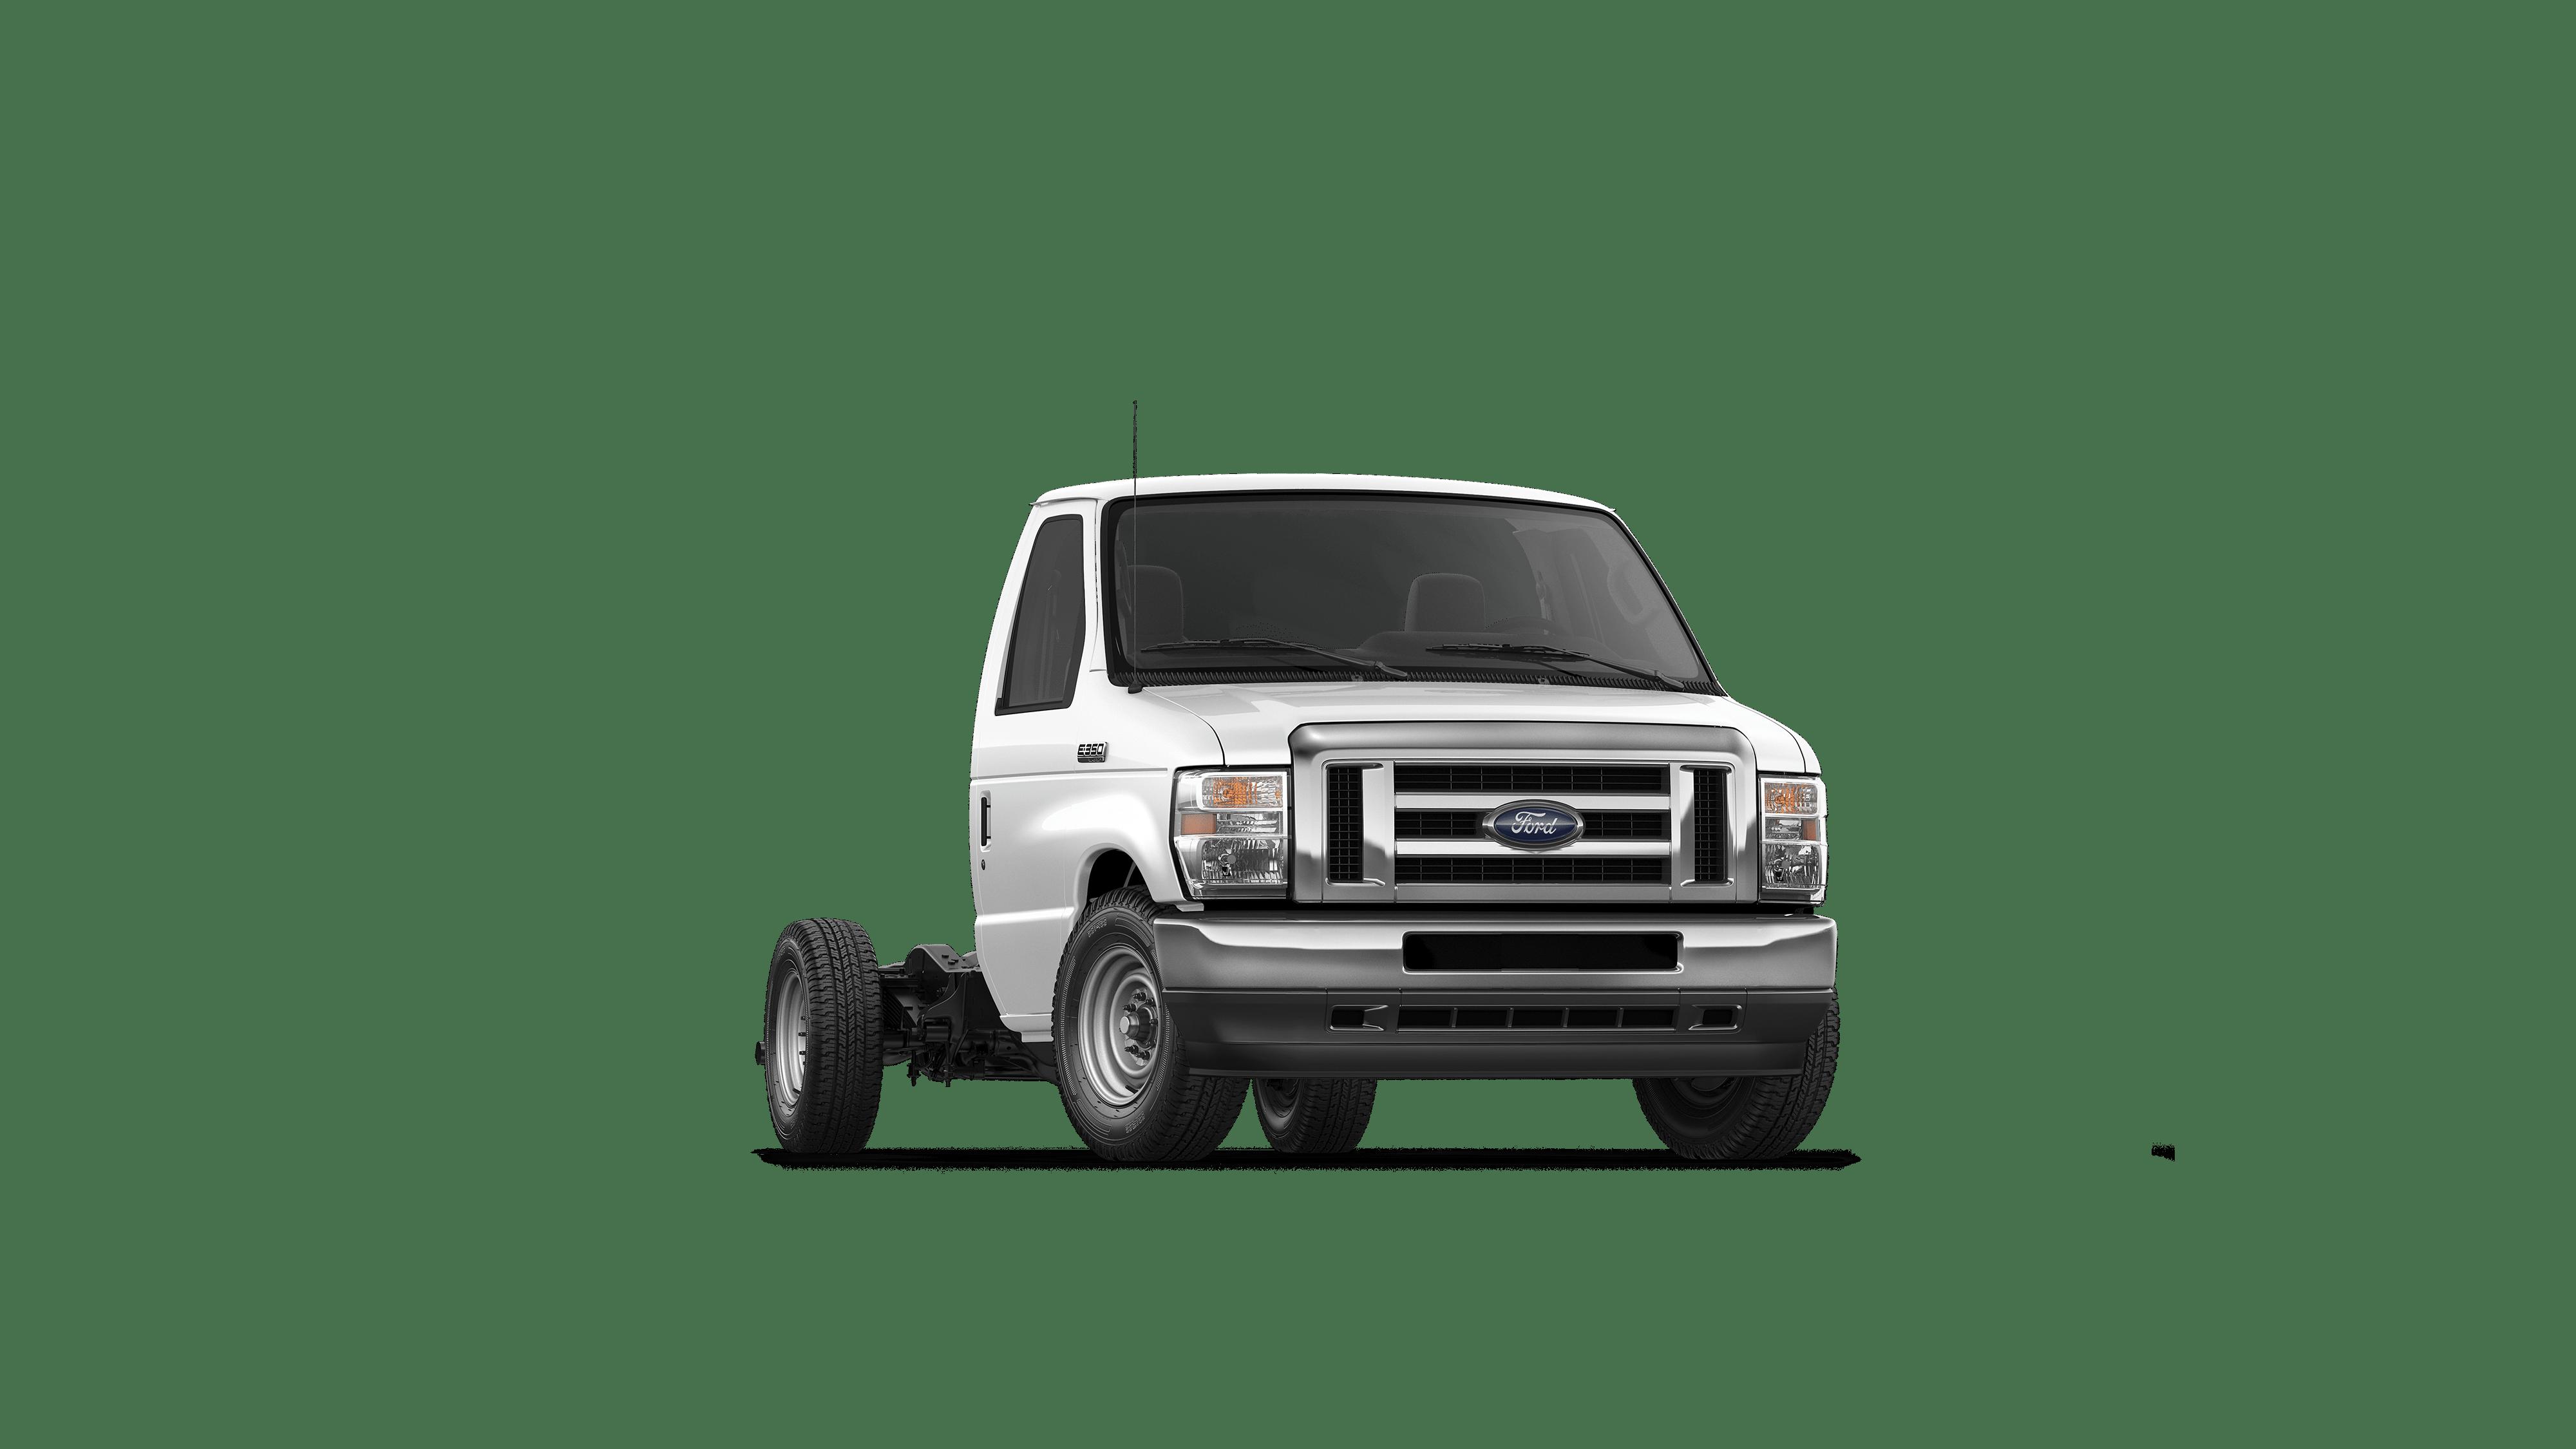 2021 Ford E-Series Cutaway Vehicle Photo in Quakertown, PA 18951-1403